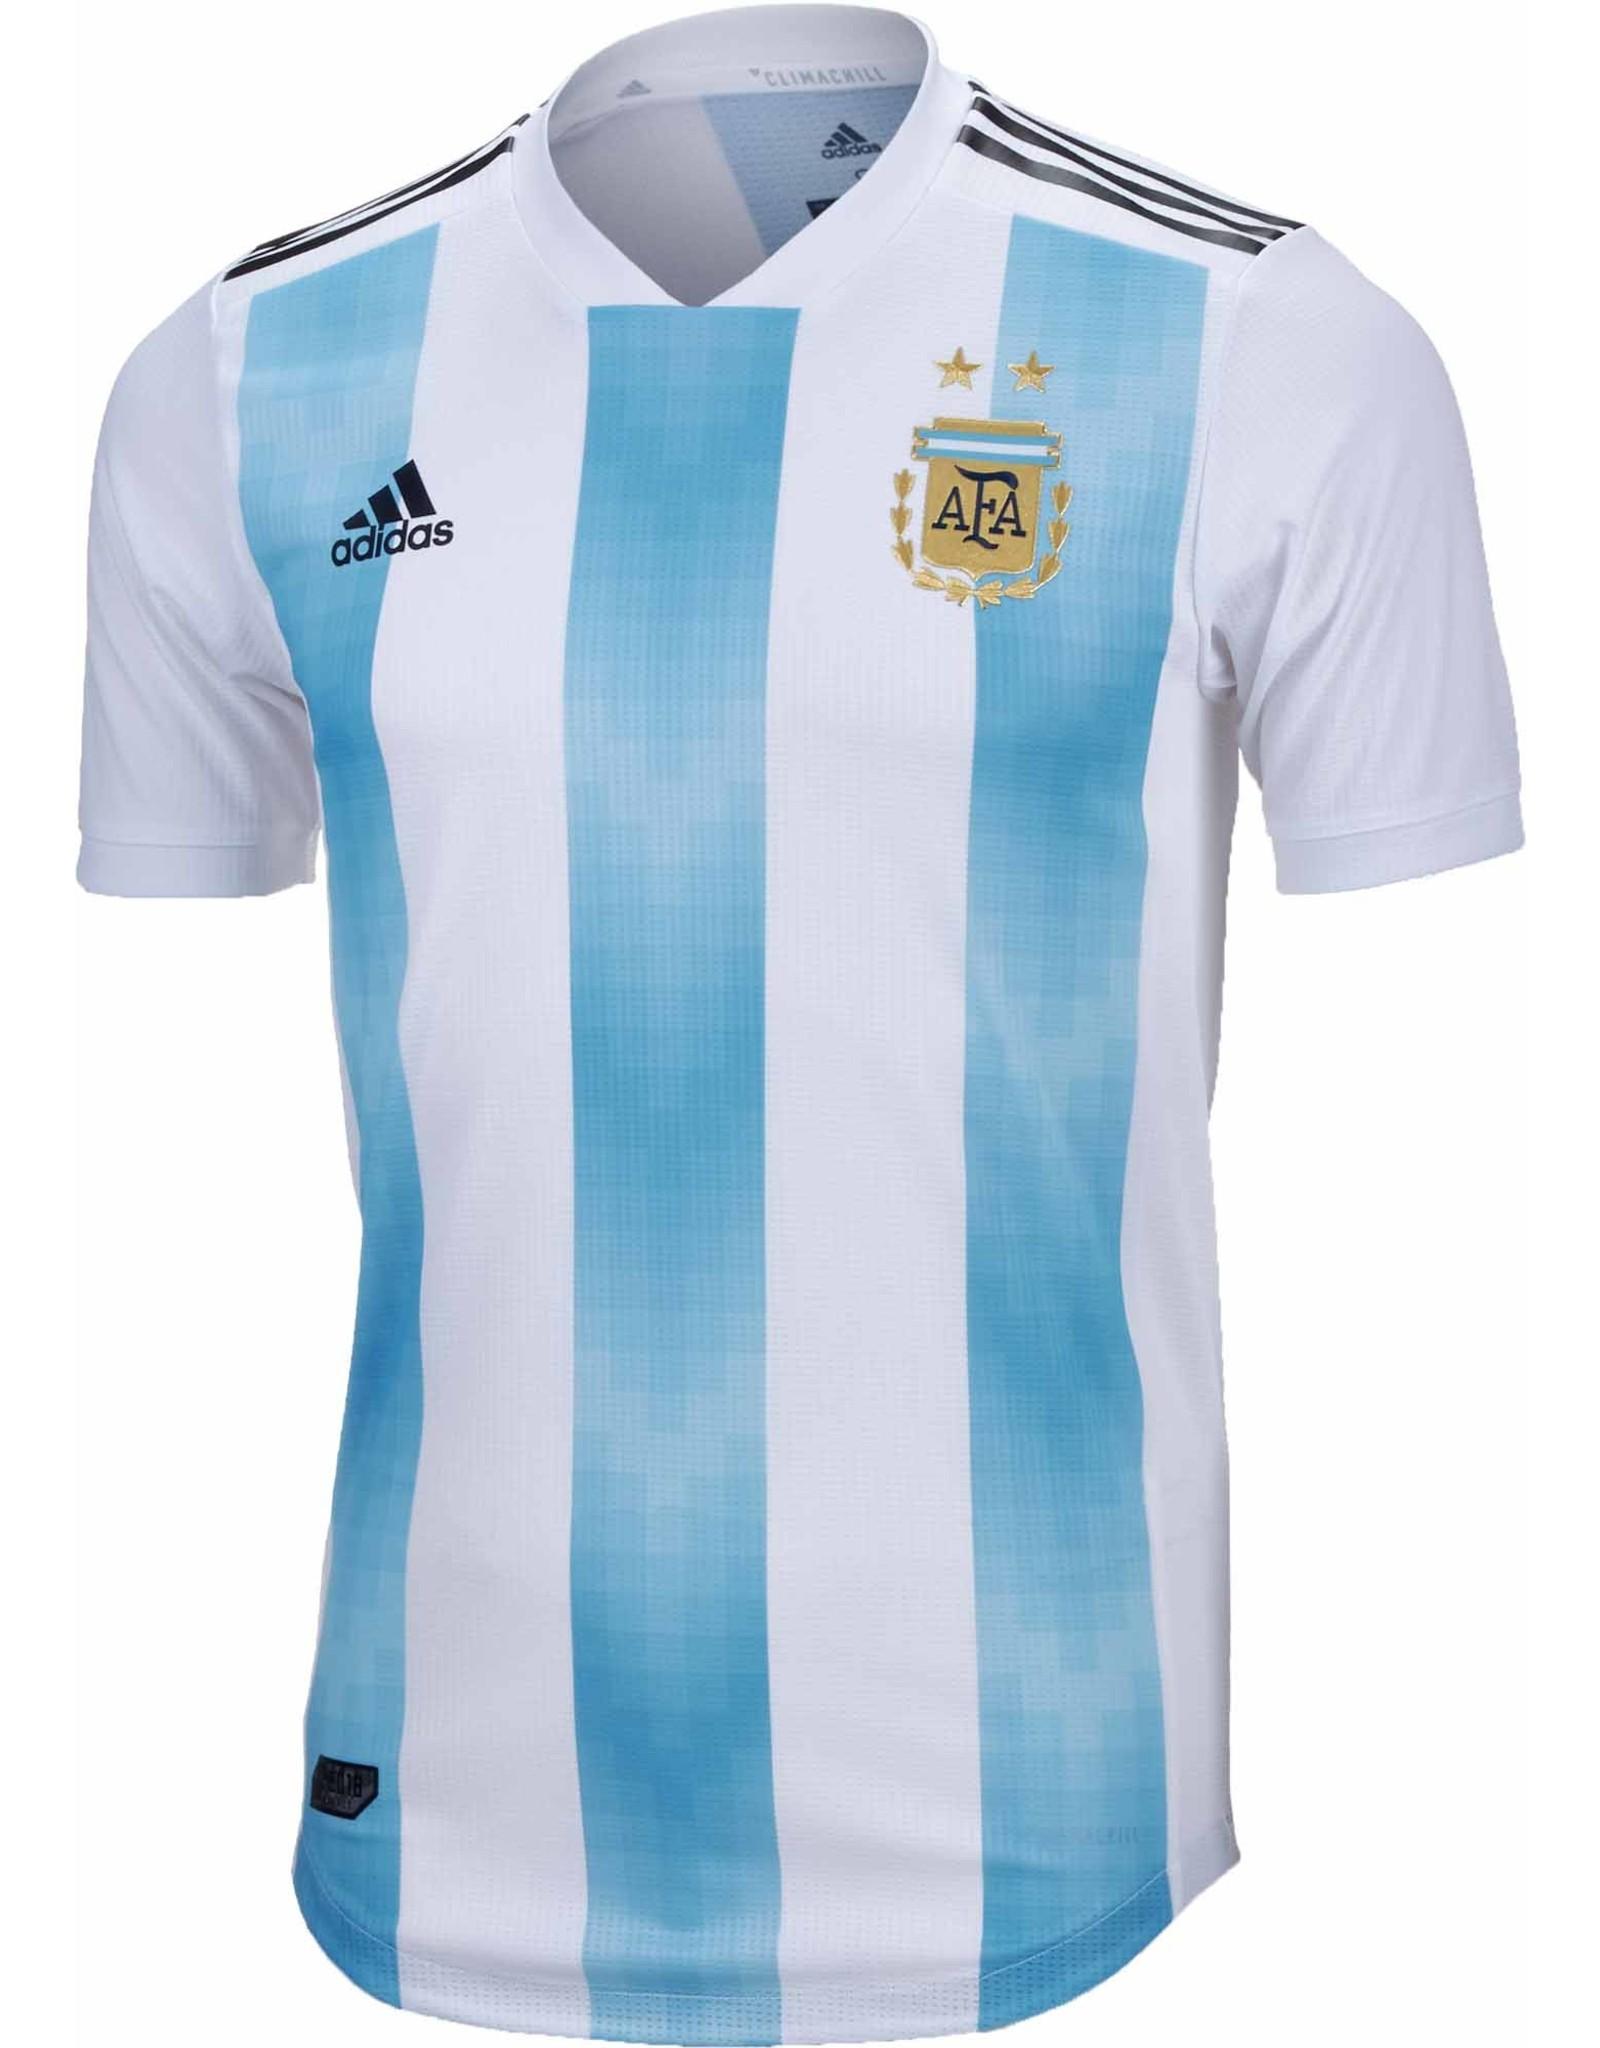 Adidas Adidas Men's Argentina 2018/19 Home Jersey